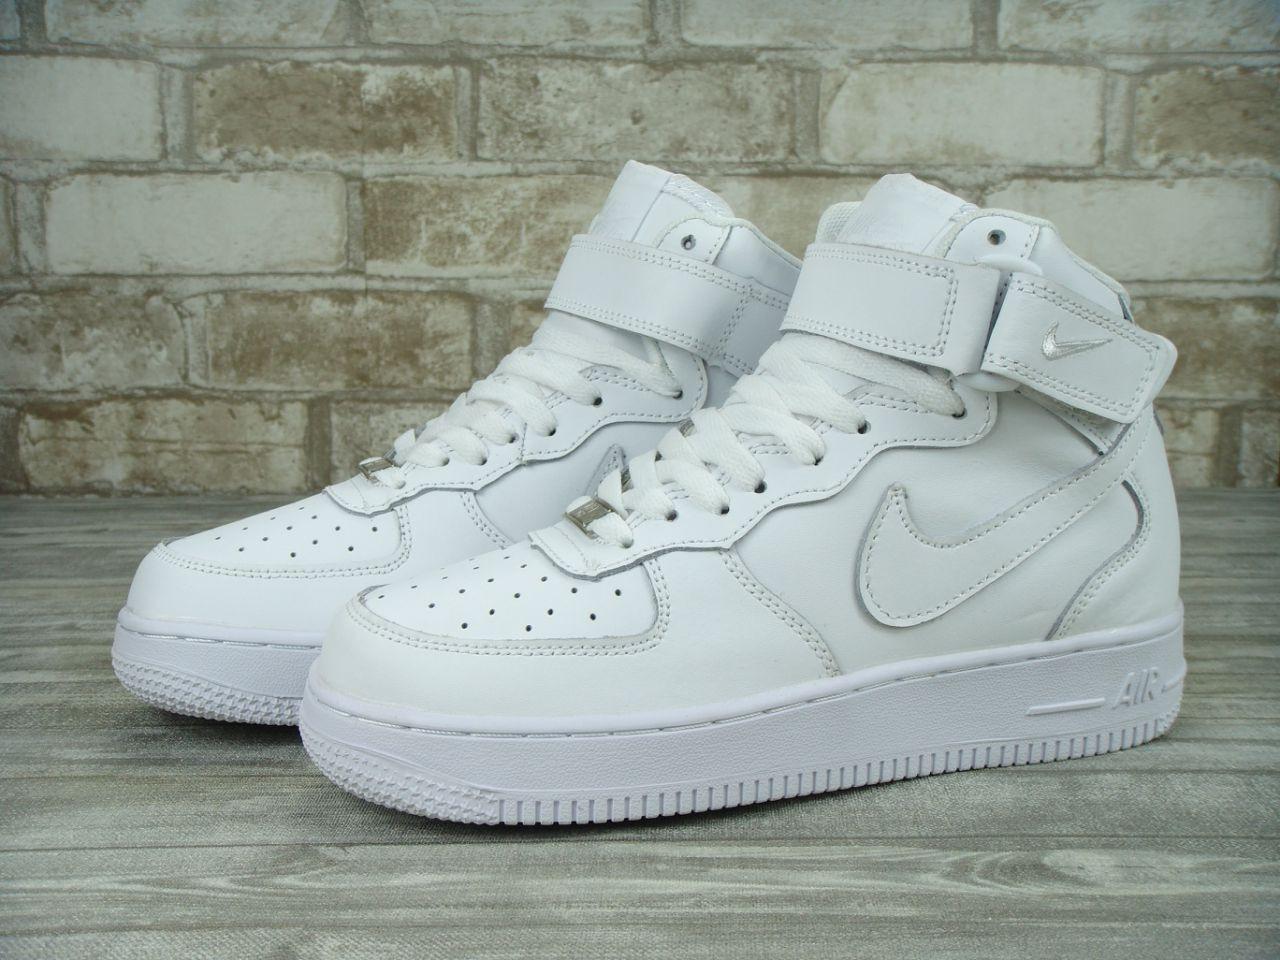 Кроссовки Nike Air Force 1 High White(ТОП РЕПЛИКА ААА+) — в Категории